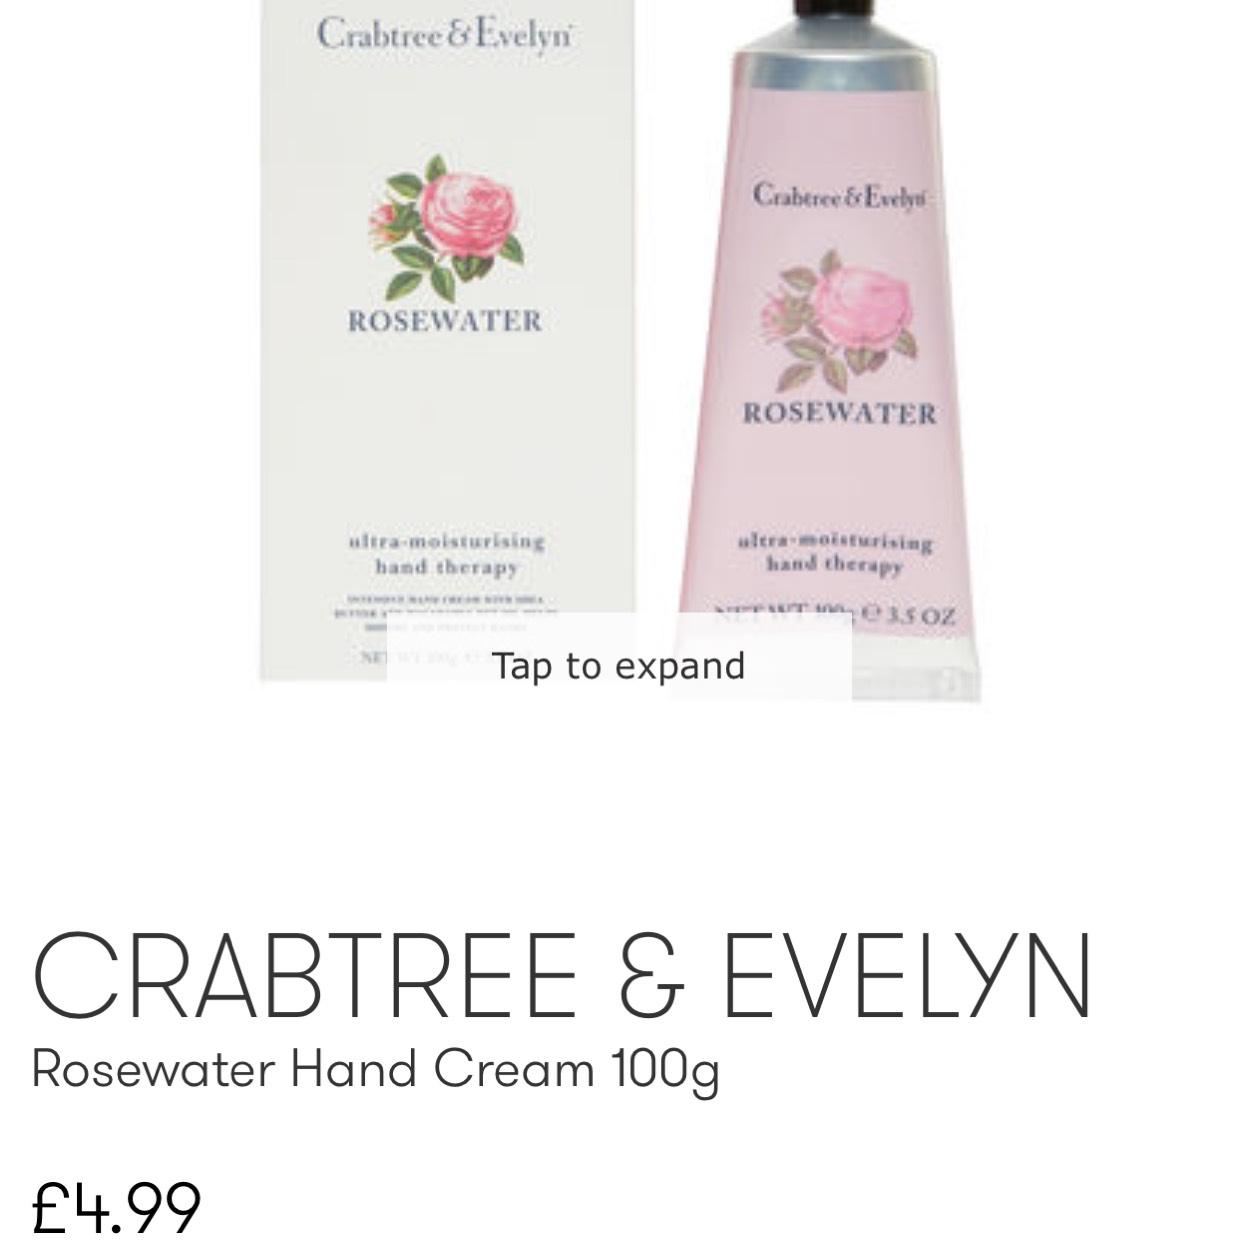 CRABTREE & EVELYN Rosewater Hand Cream 100g £4.99 instore @ TKMaxx